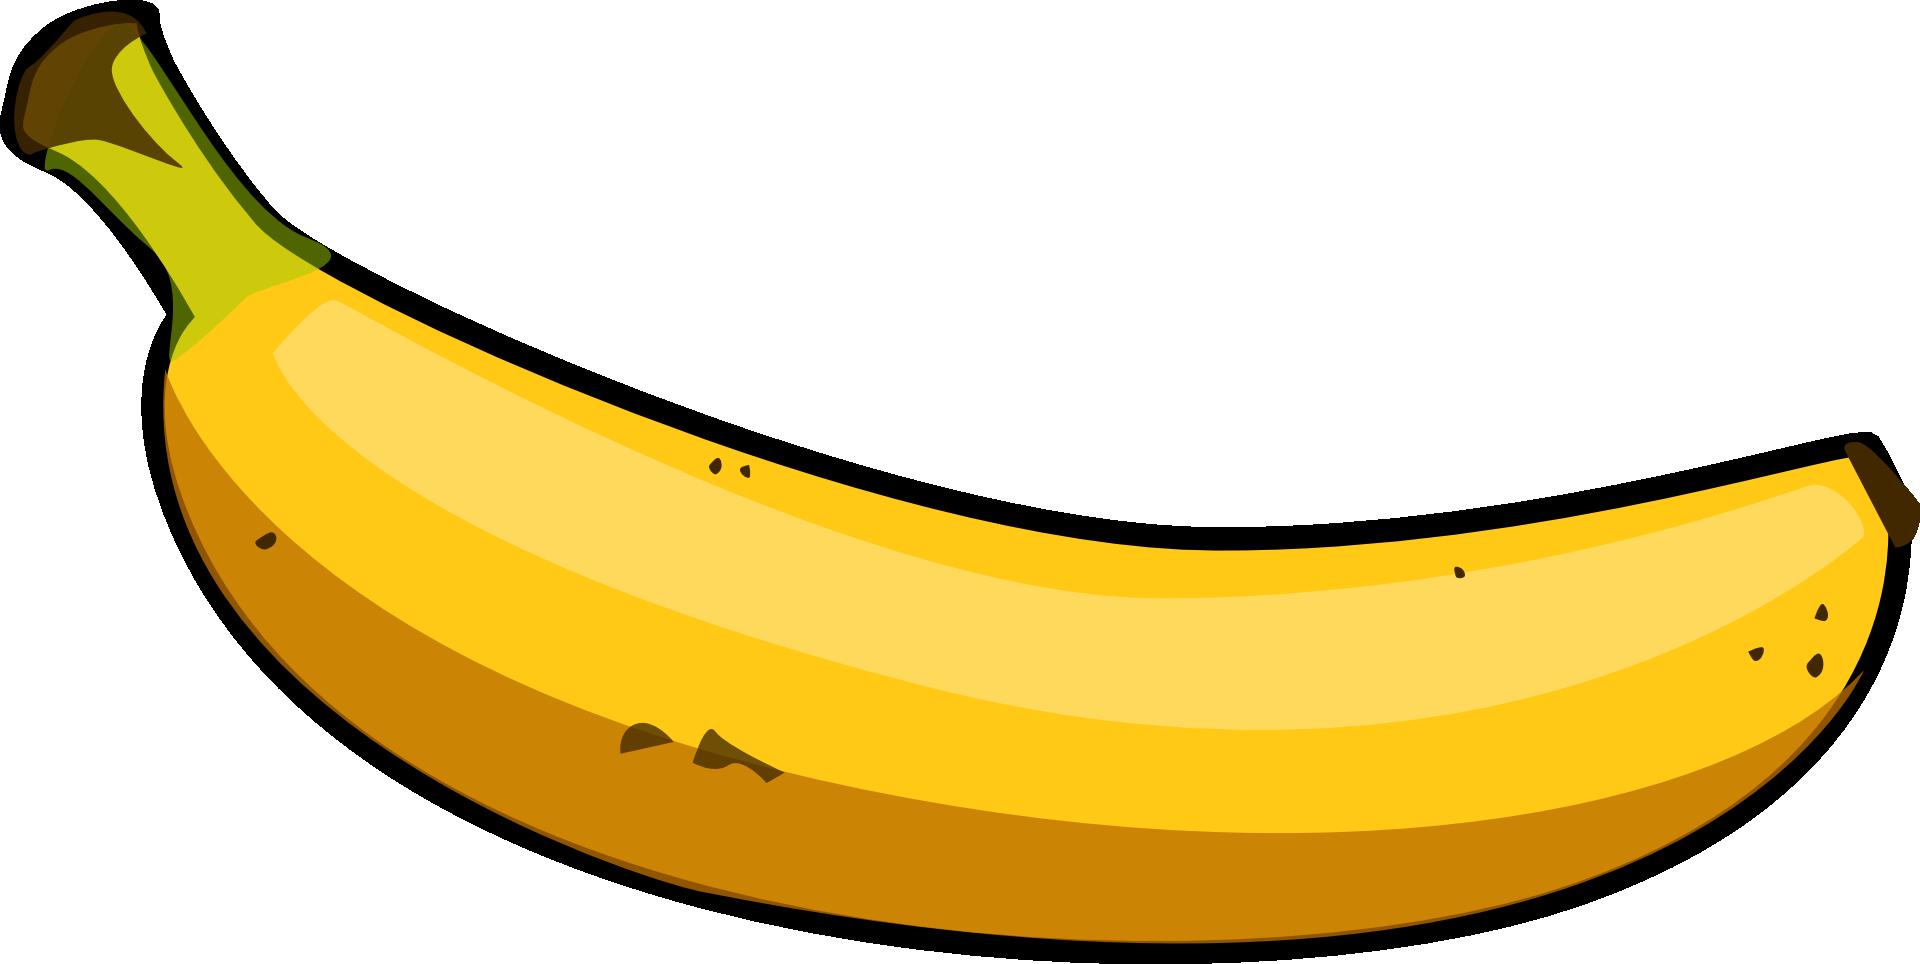 Banana clipart #4, Download drawings